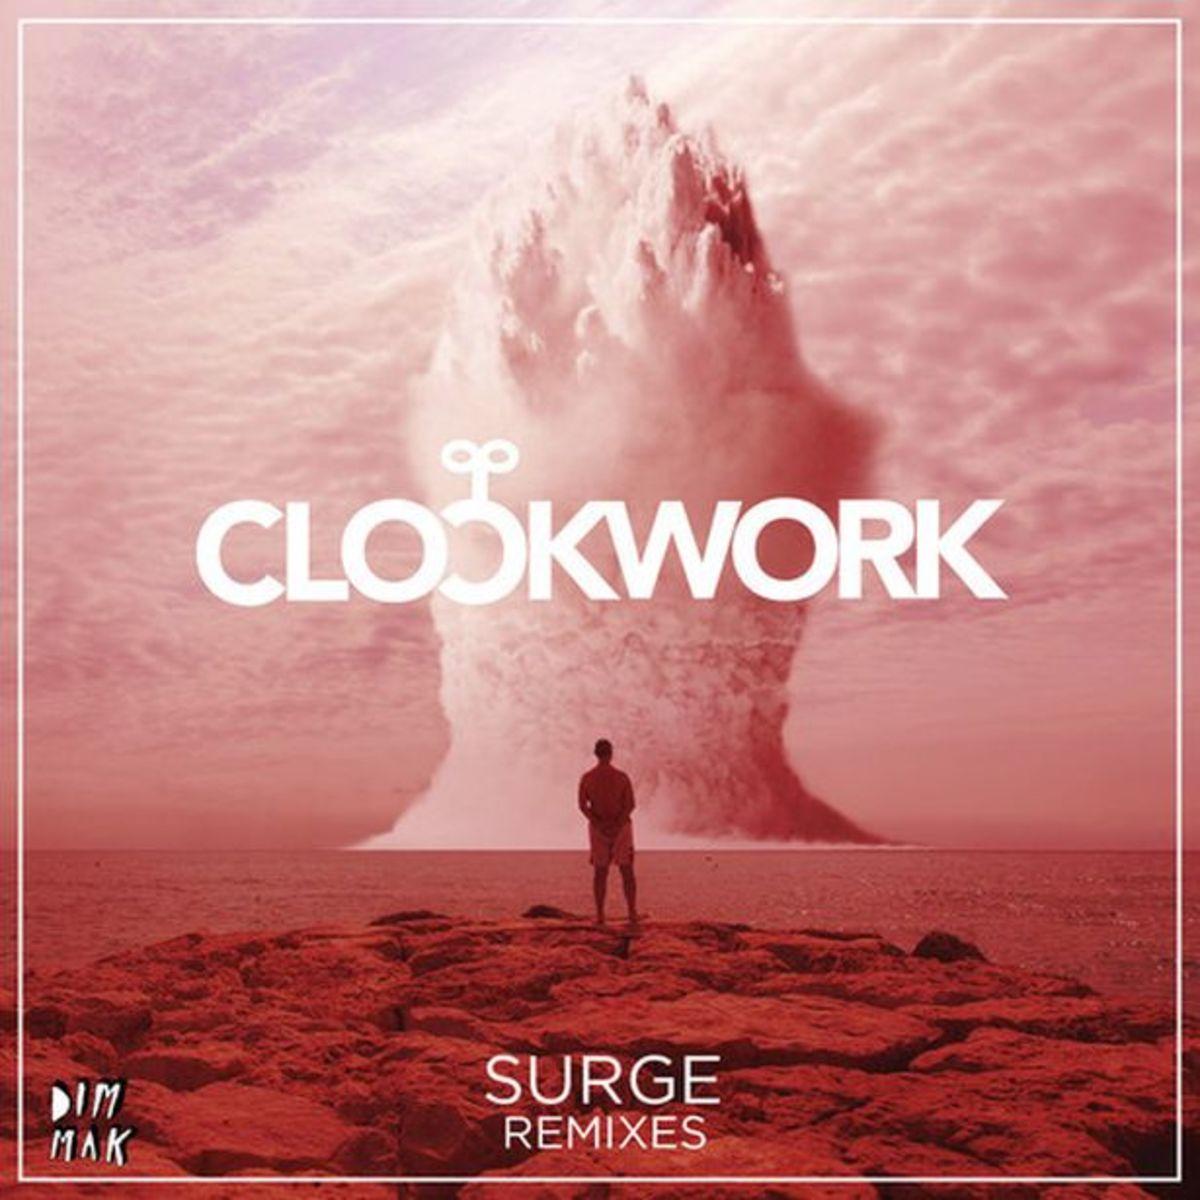 "EDM Download: Clockwork Shares The Charlie Darker Remix Of ""Surge""; Remix Package Out August 13 Via Dim Mak Records"